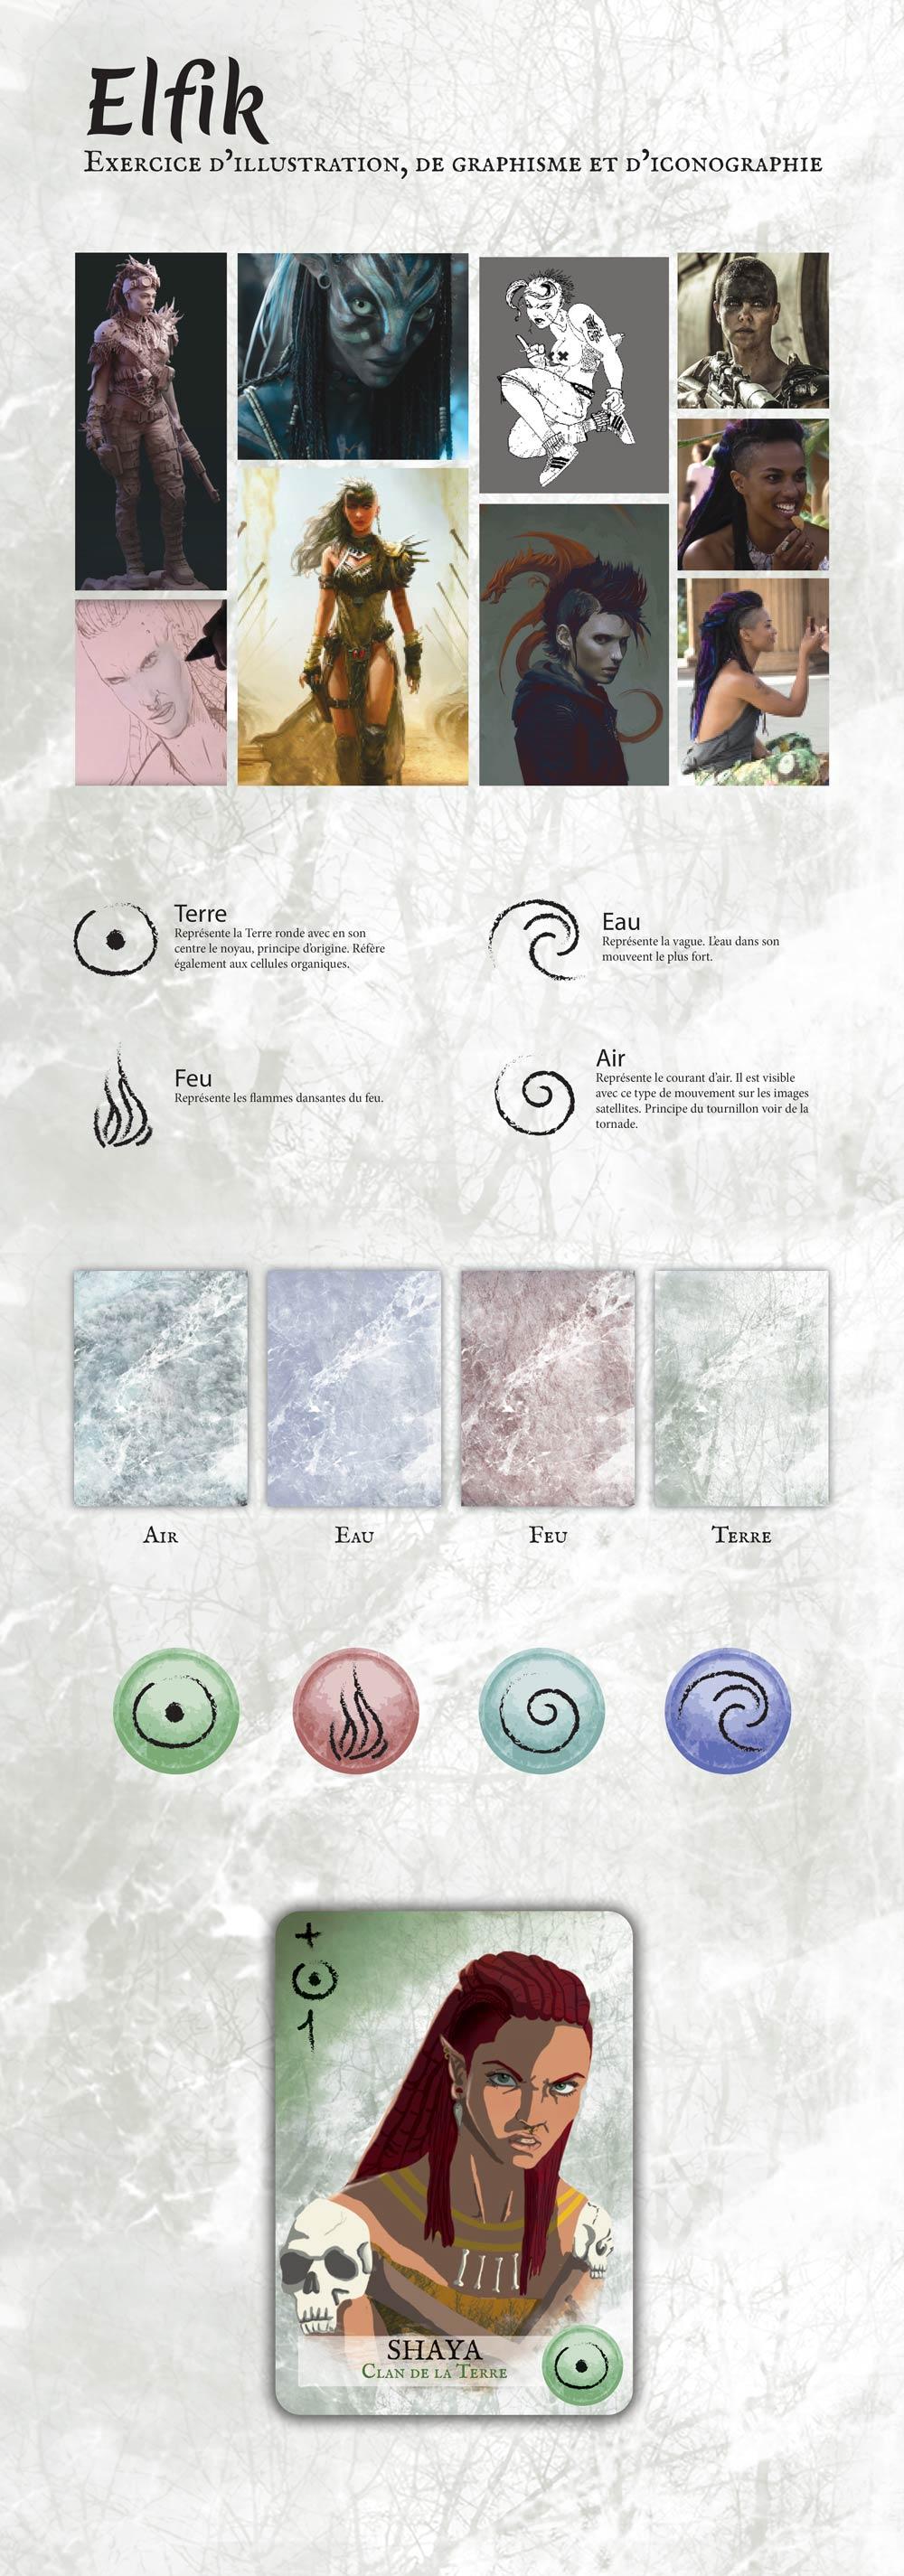 Contenu et illustration de la carte Elfik